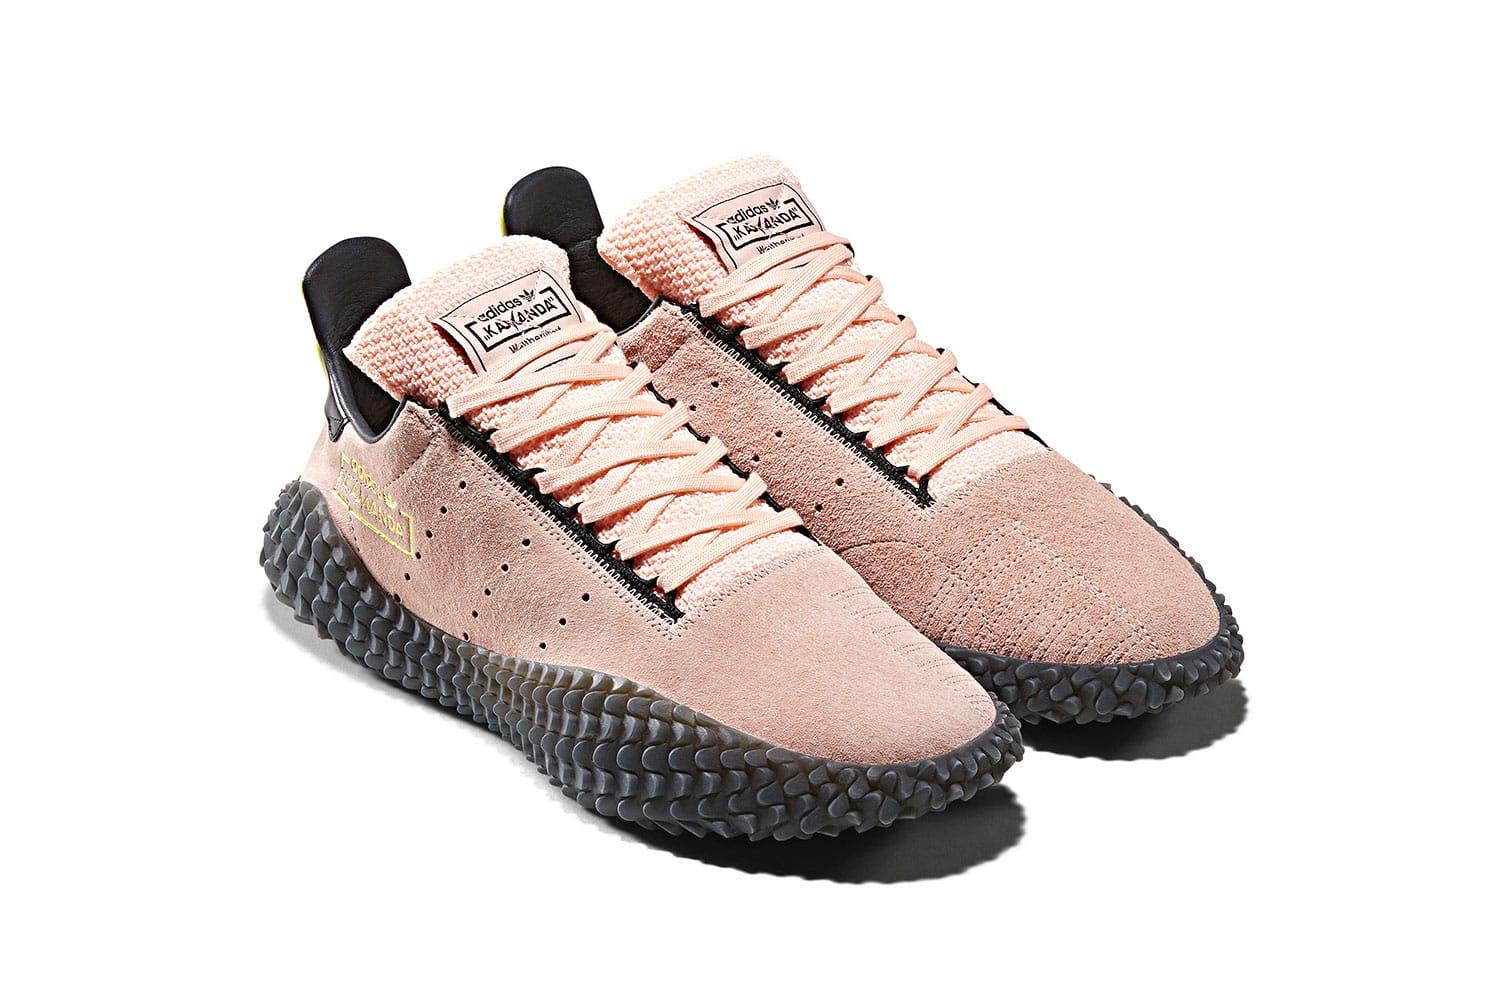 buu adidas shoes cheap online